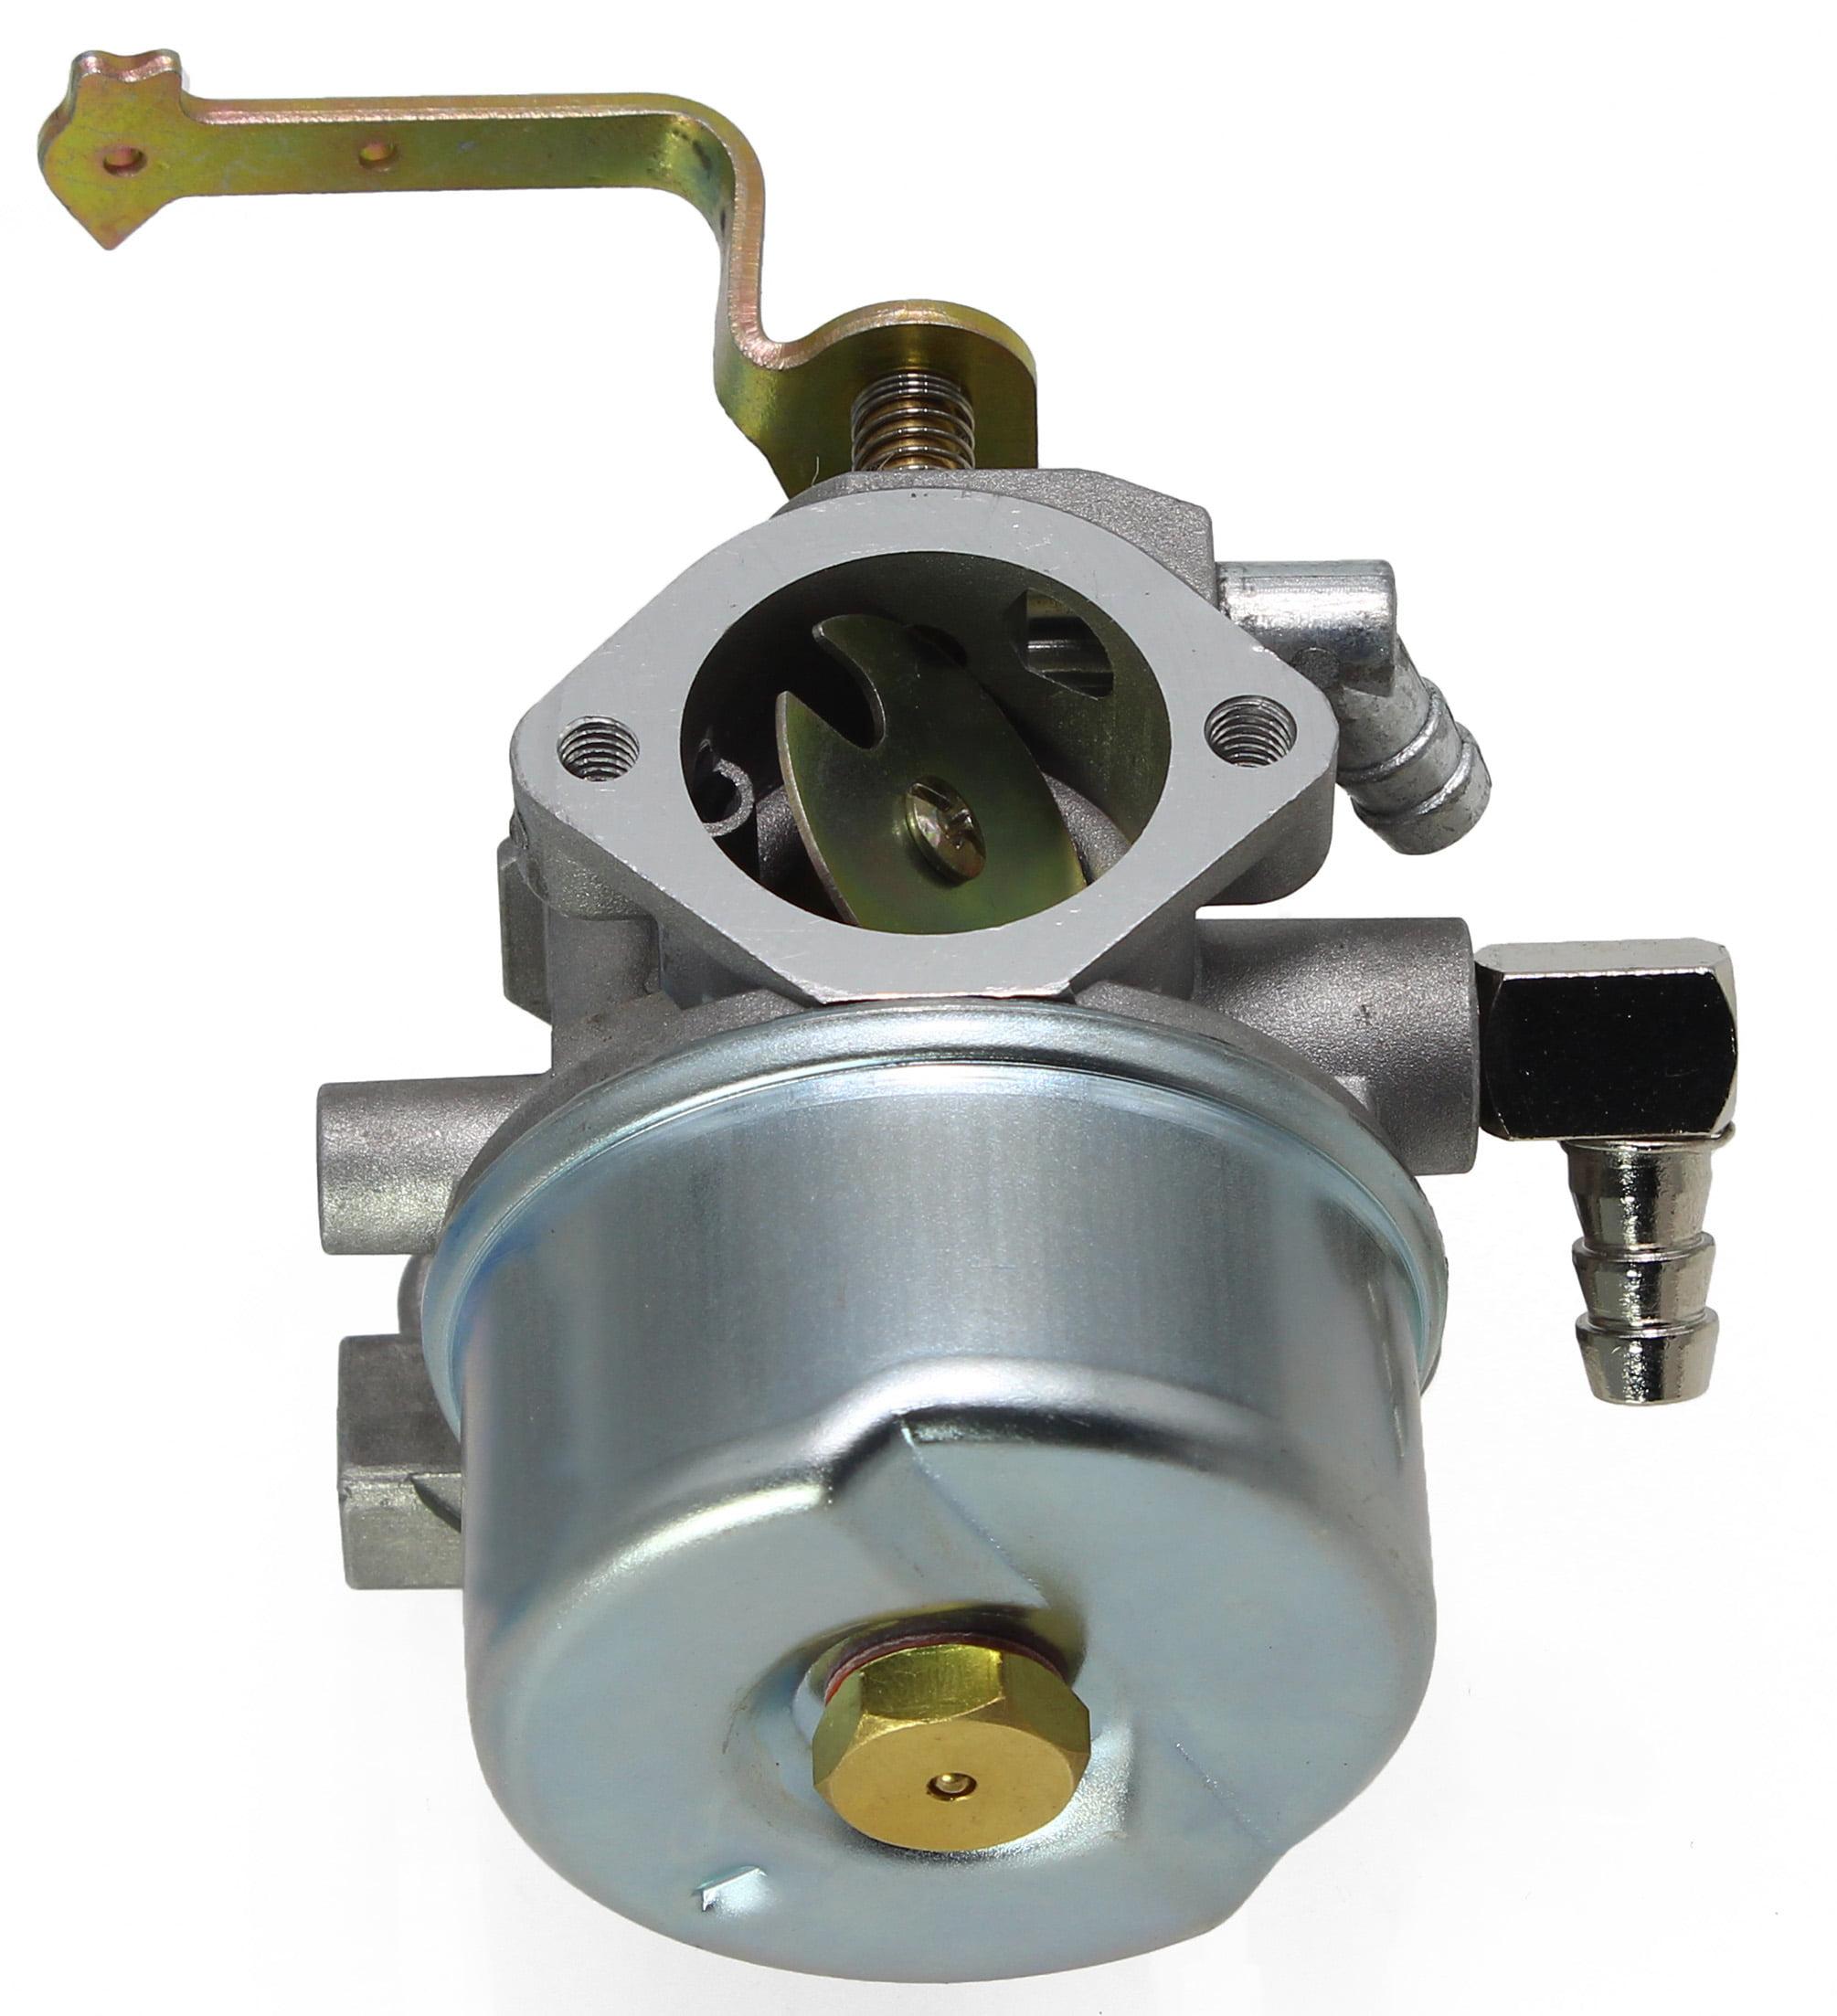 CARBURETOR Fit For Tecumseh 640152A HM80 HM90 HM100 8-10 HP Generator Engines